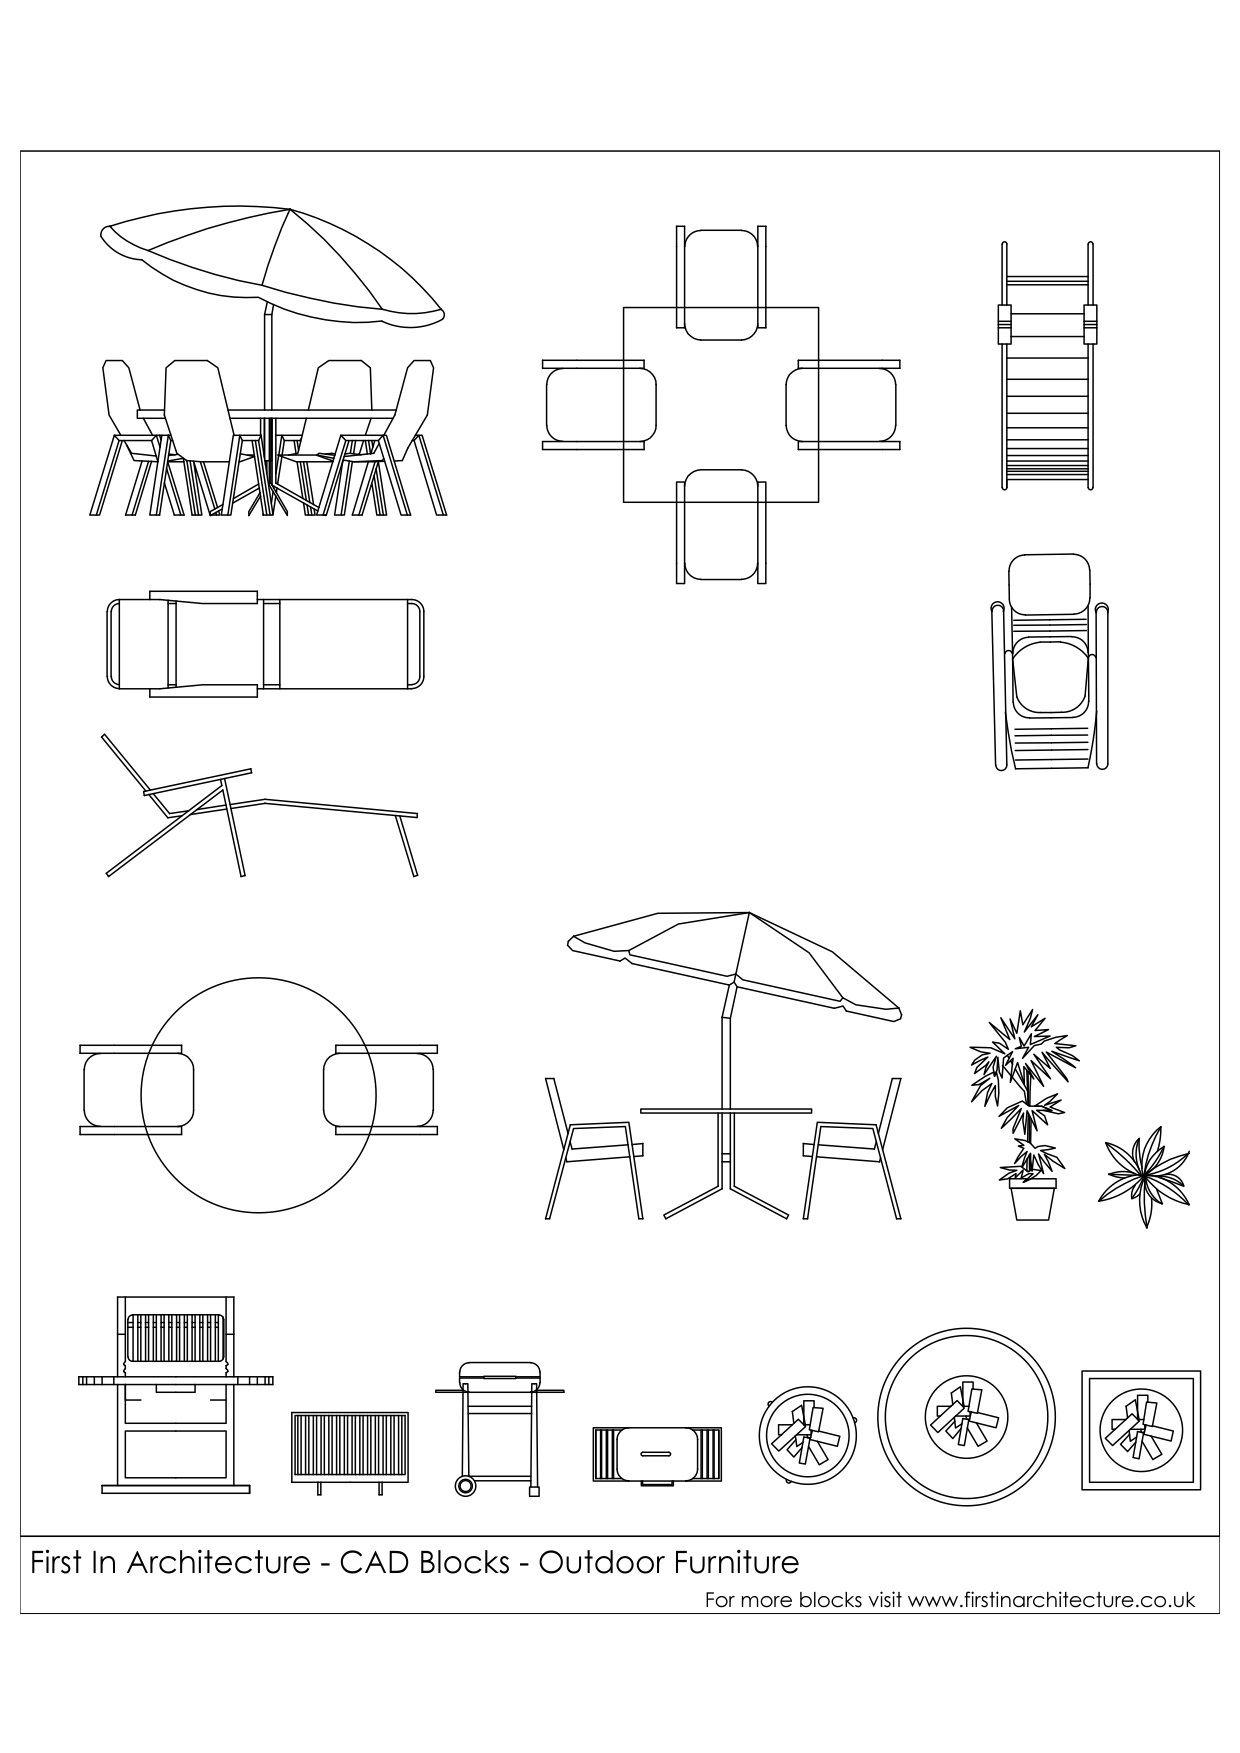 floor plan symbols symbols pinterest symbols small house free cad blocks outdoor furniture first in architecture